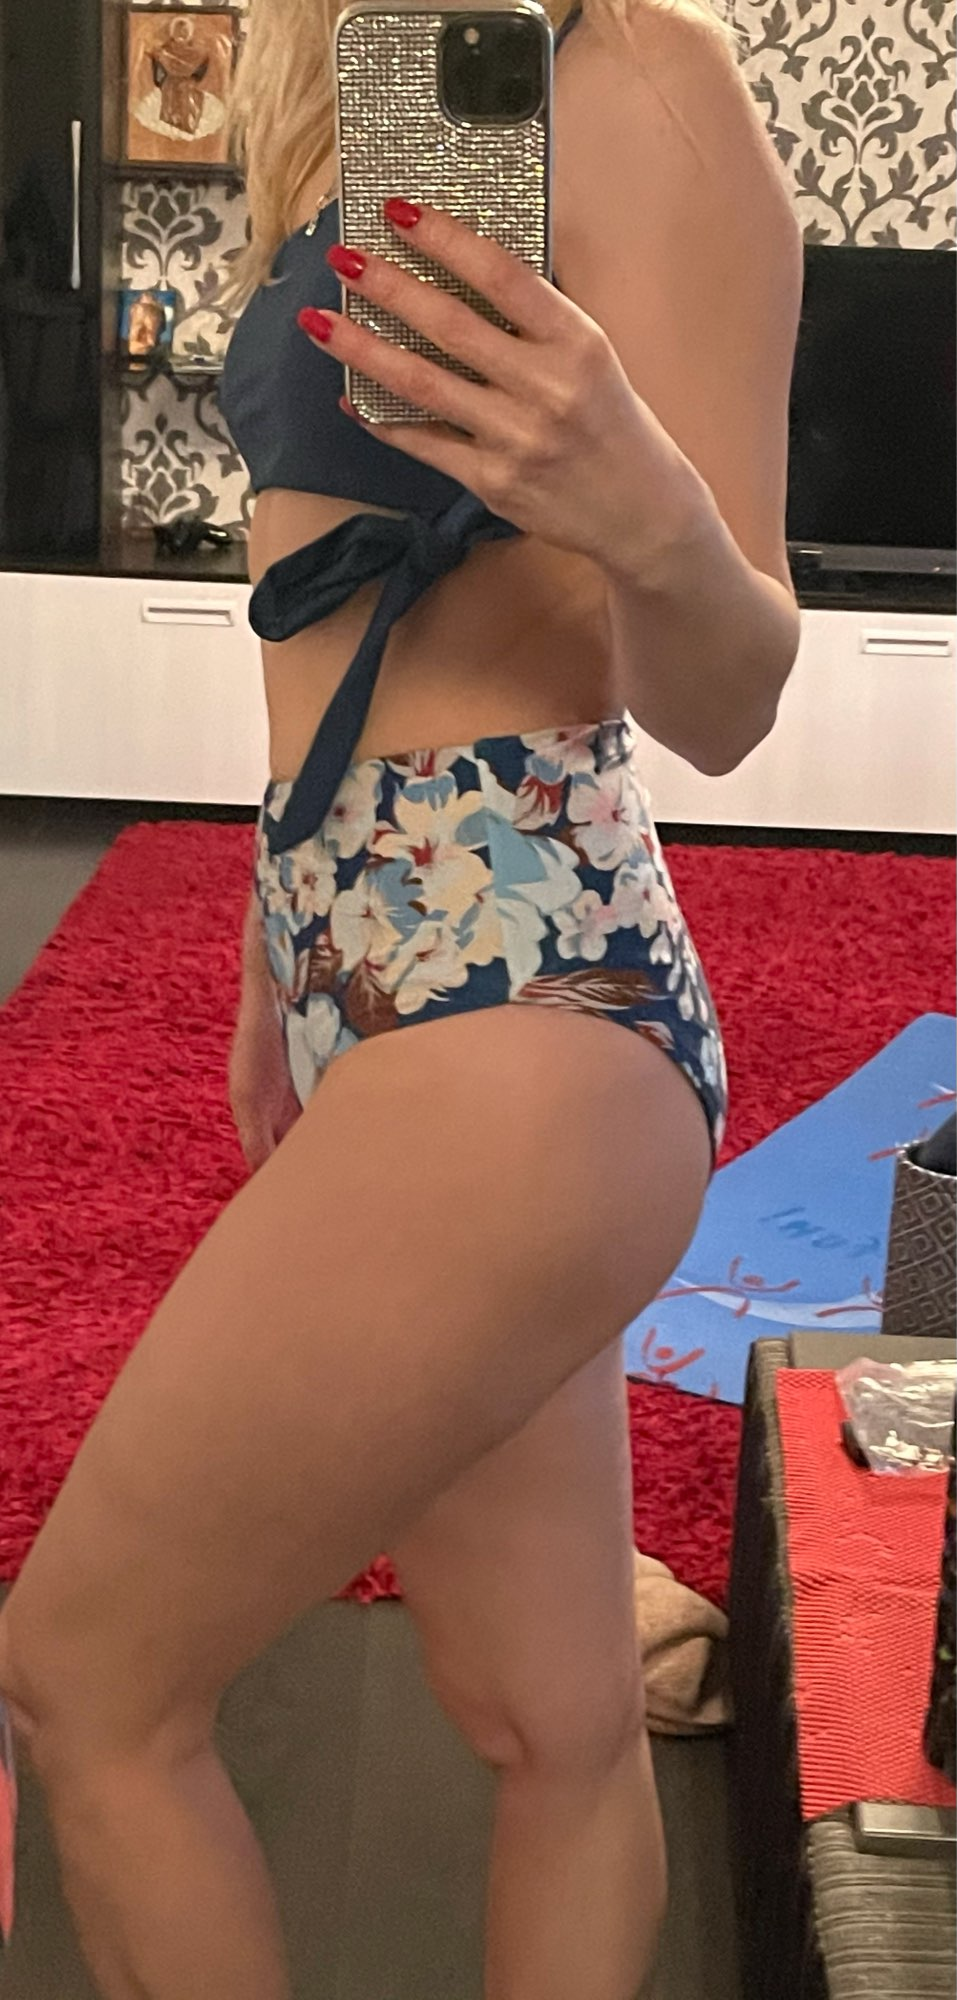 Sexy Bikinis Women 2021 New One Shoulder Swimwear High Waist Swimsuit Bandage Bathing Suits Beach Wear Biquini Female|Bikini Set|   - AliExpress